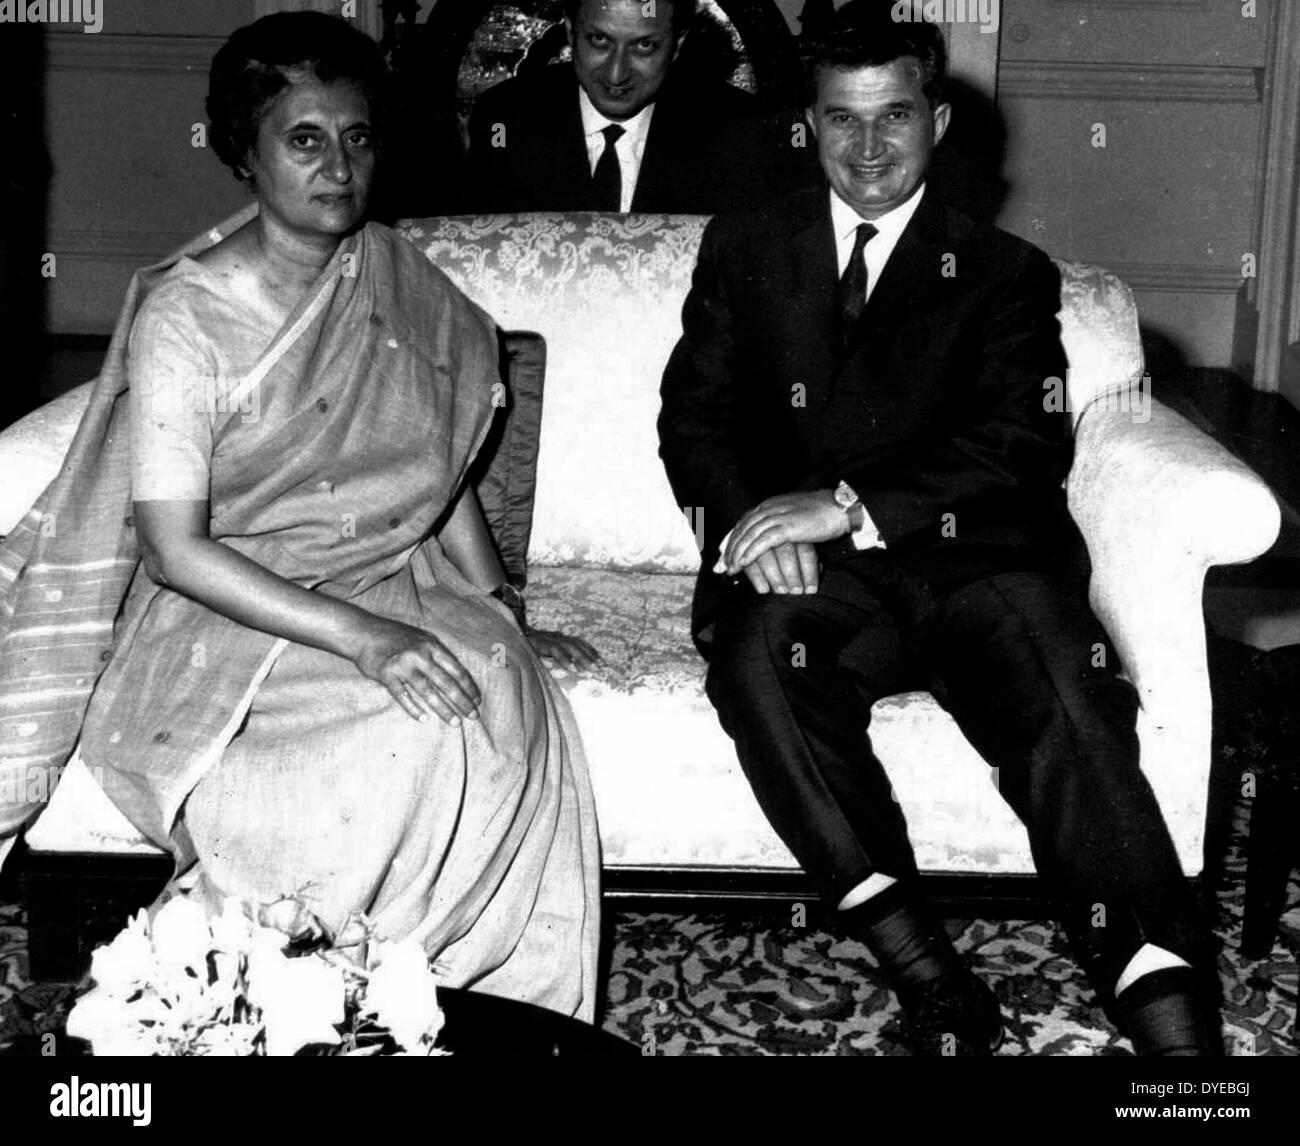 Indira Gandhi 1919-1984 Prime Minister of India with Rumanian leader Nicolae Ceau?escu - Stock Image